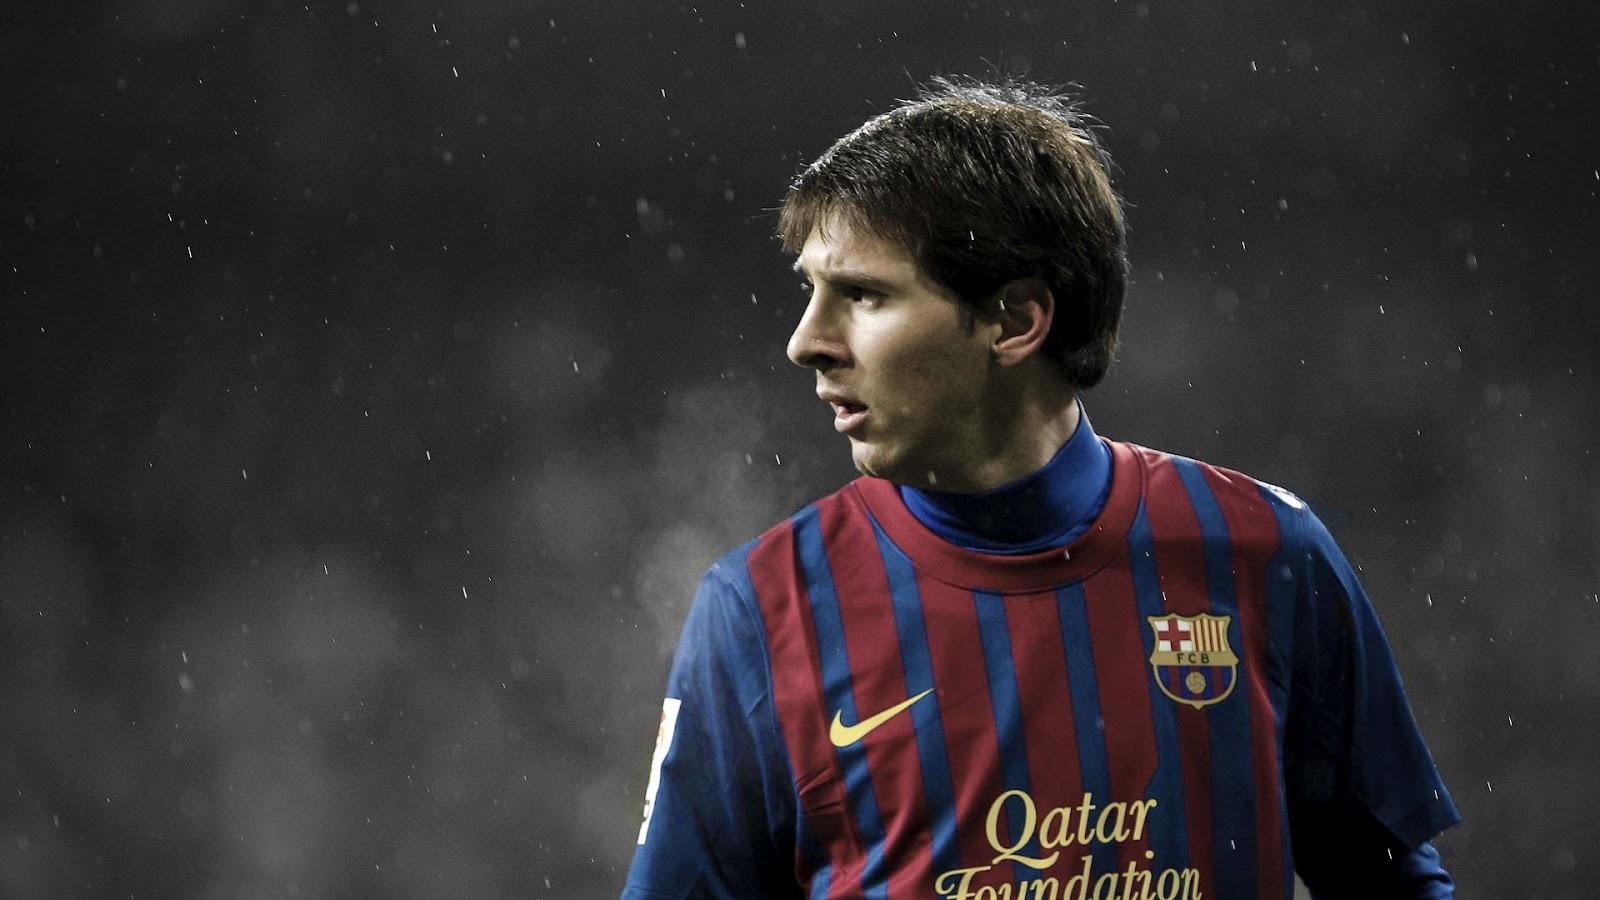 Lionel Messi HD Wallpaper 1600x900